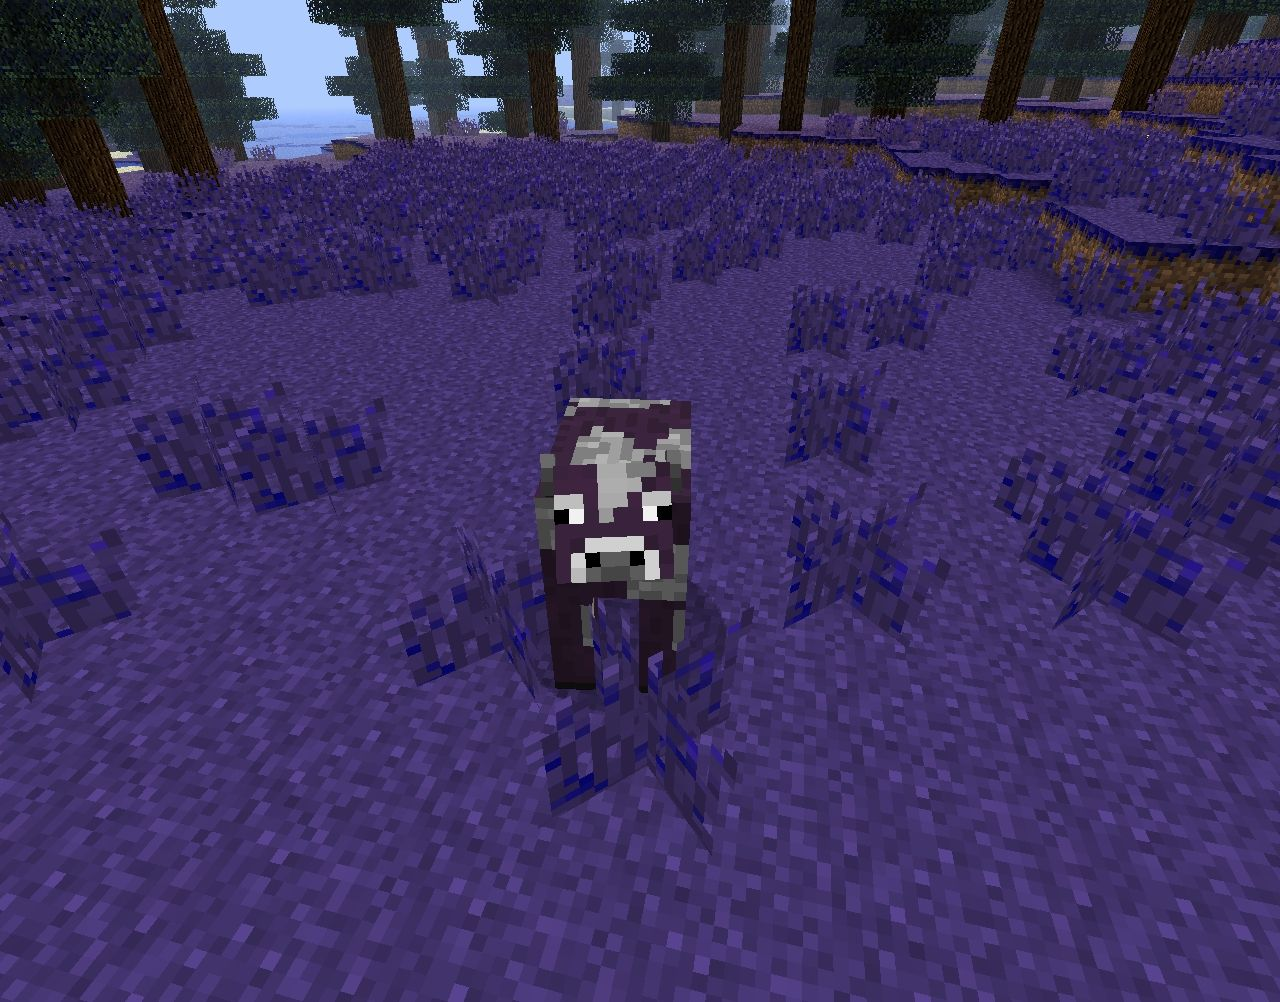 Purple cows!